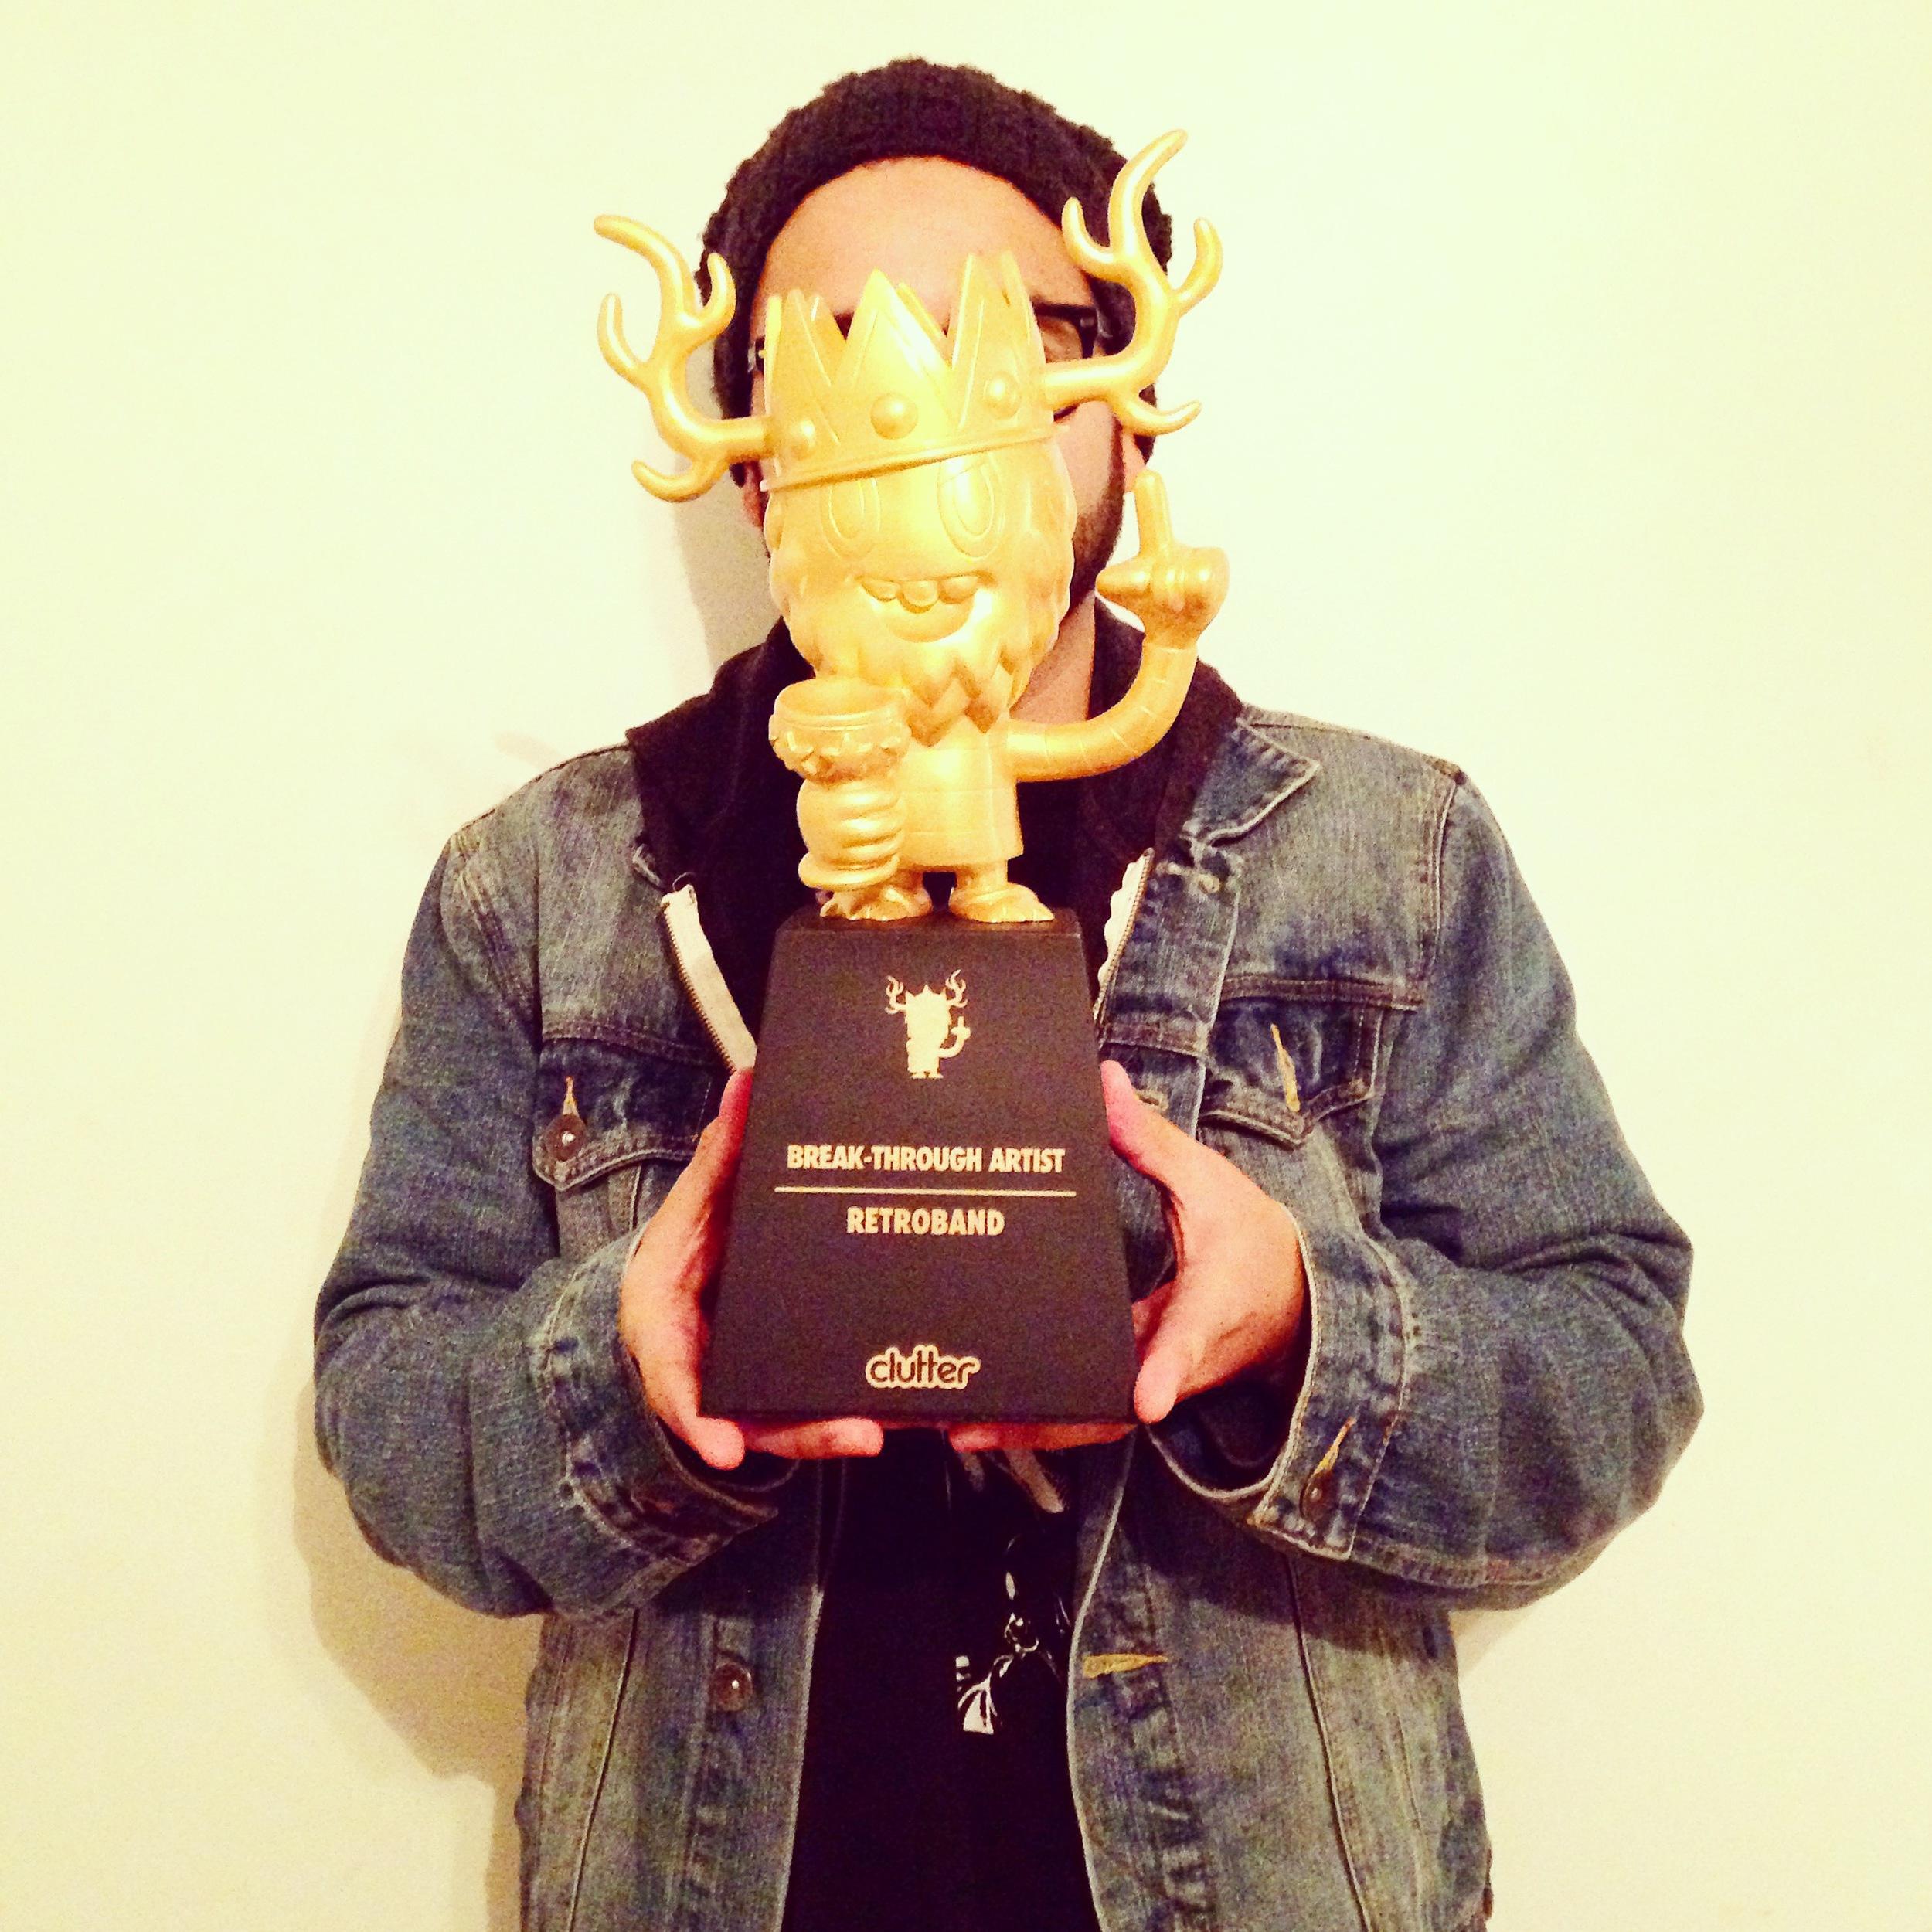 2014 Designer Toy Awards-Break Through Artist